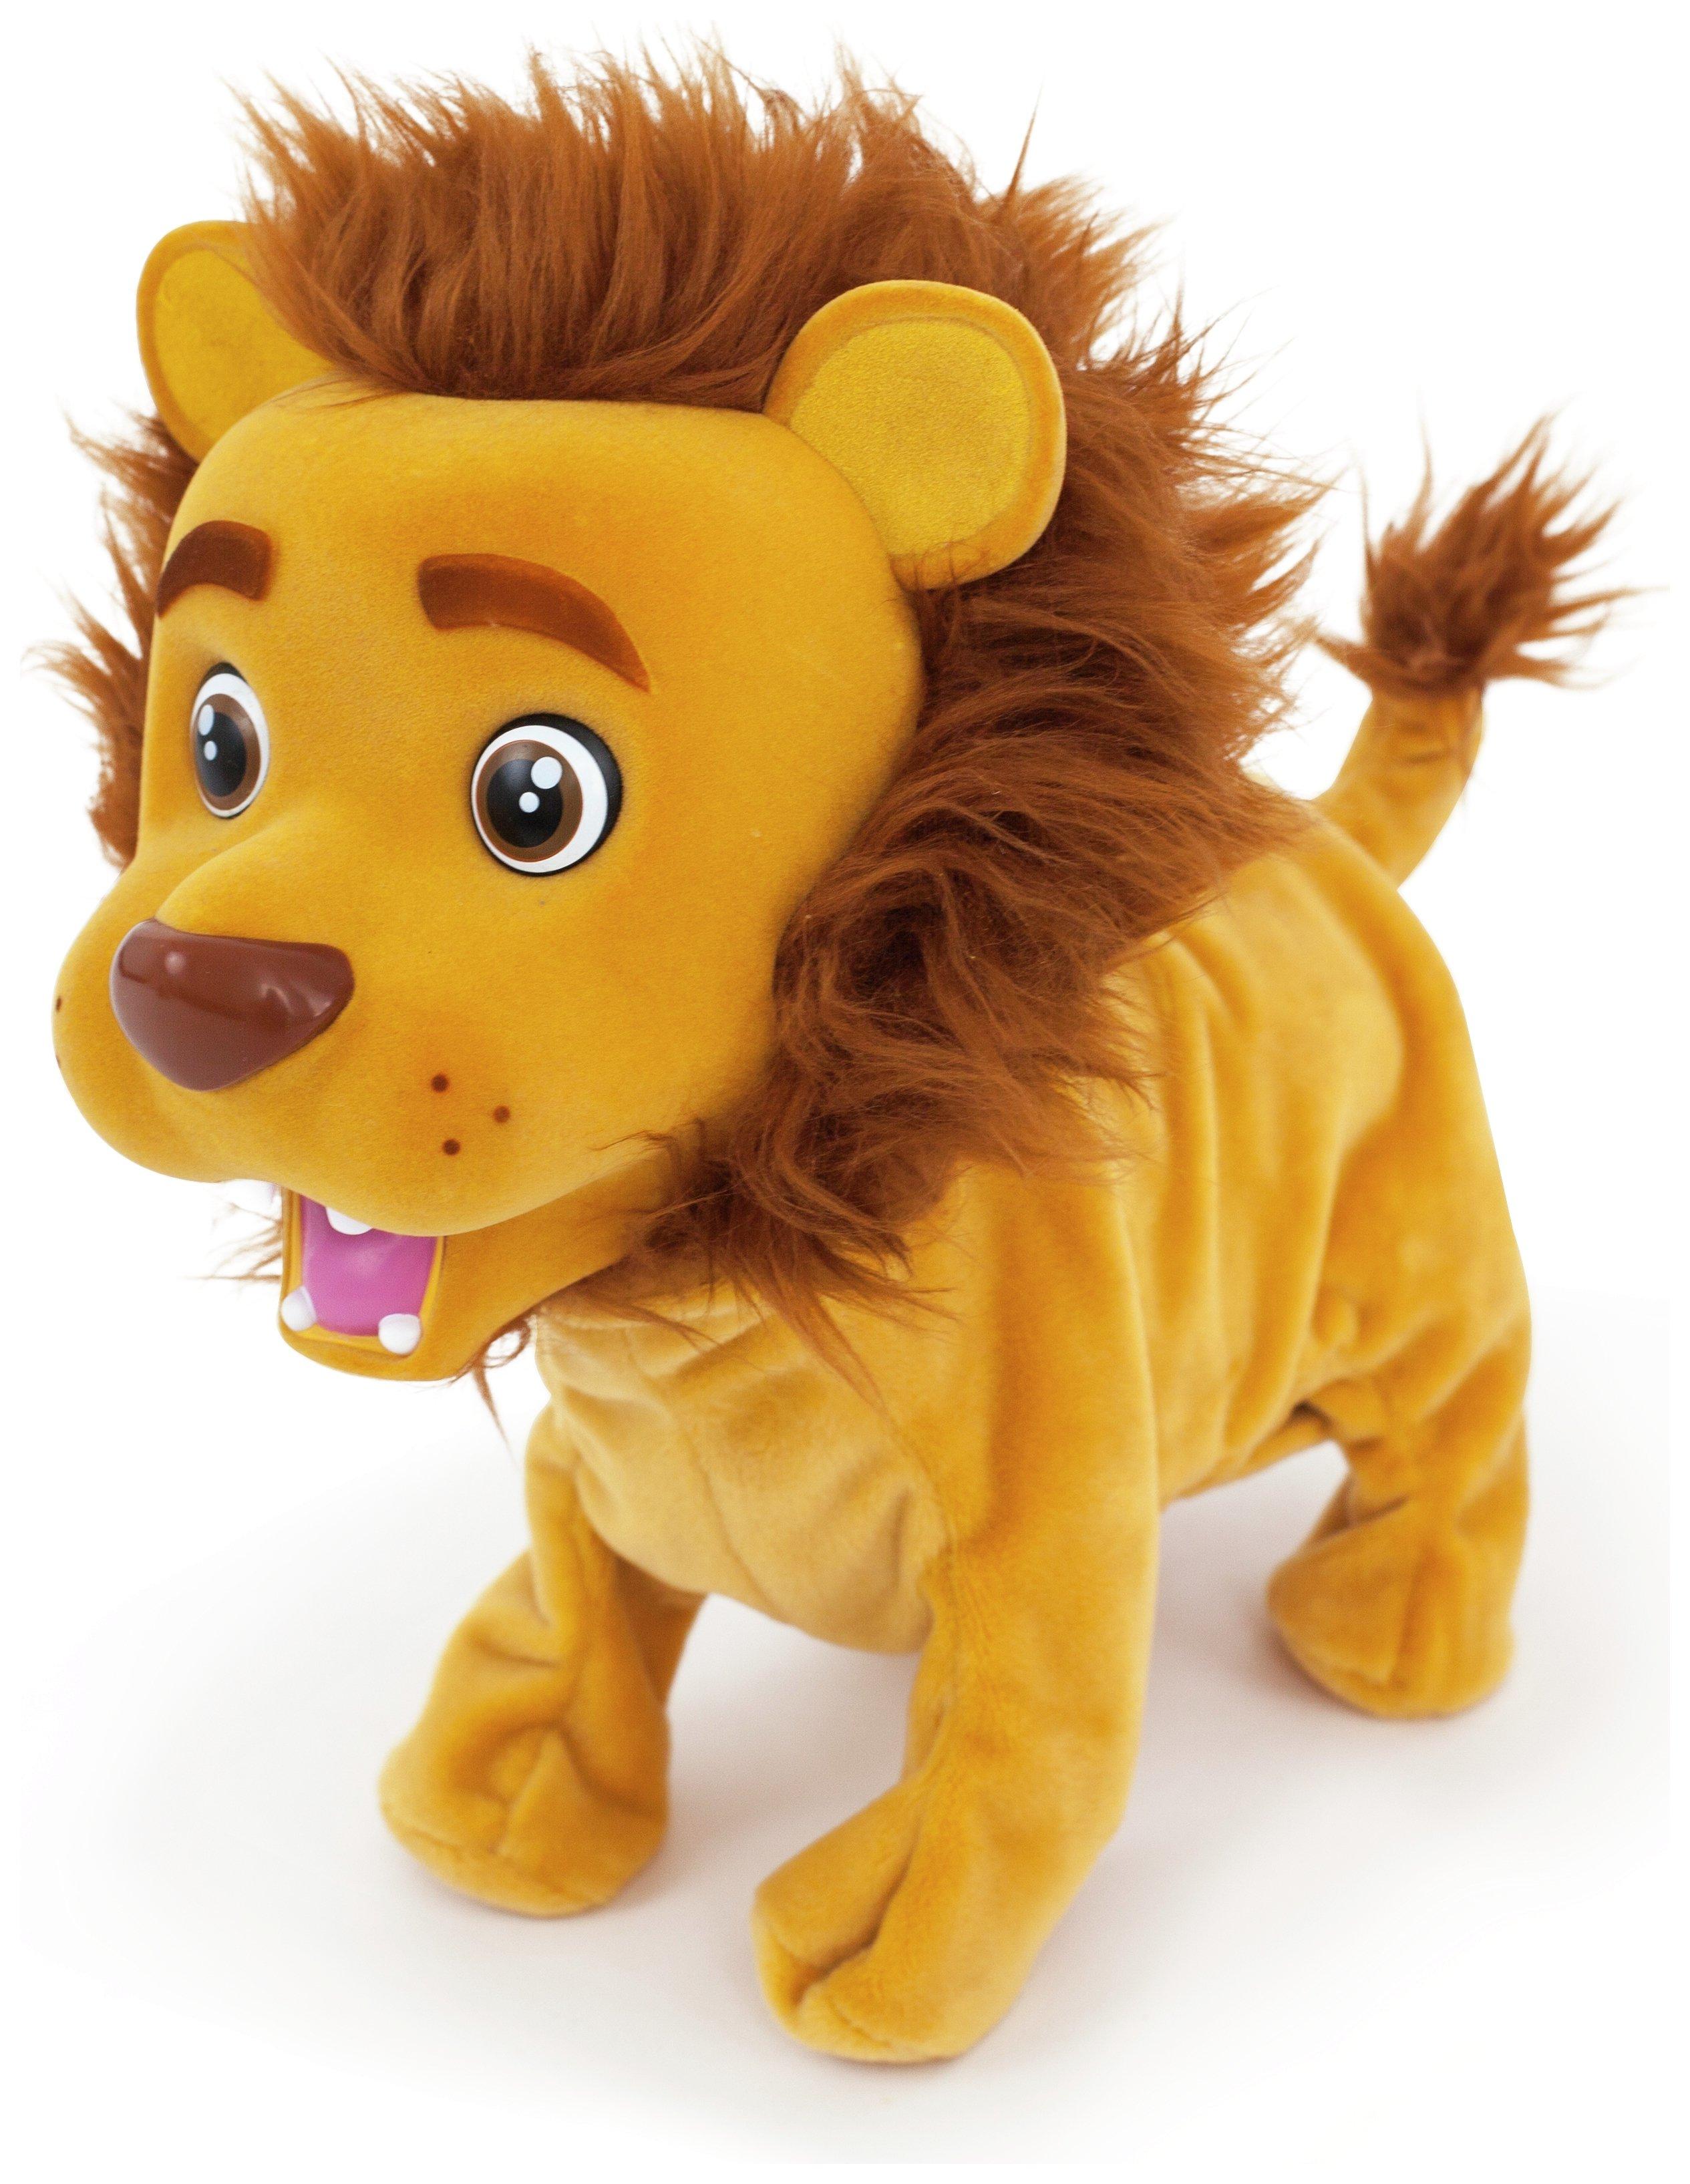 Club Petz Kokum the Little Lion Interactive Plush